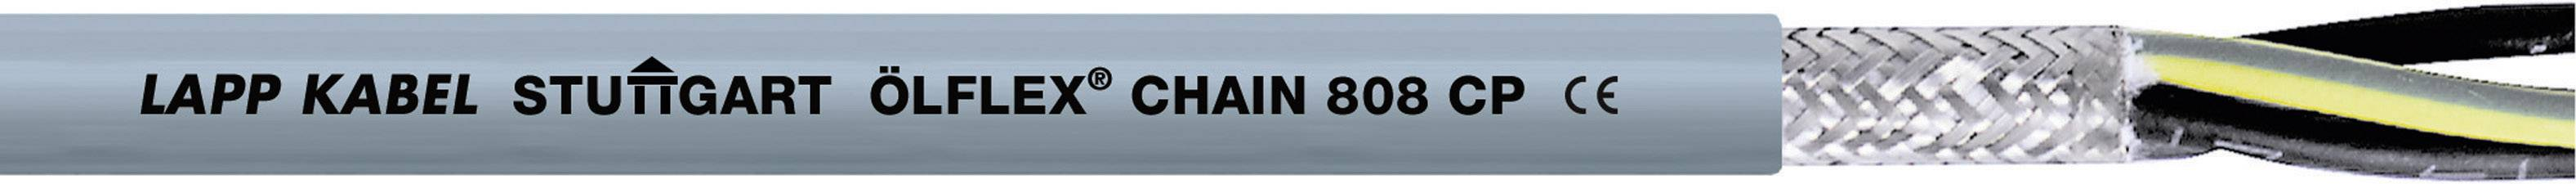 Žíla kabelu LappKabel ÖLFLEX CHAIN 808 CP 5G0,75 (1027762), 5x 0,75 mm², polyurethan, Ø 7,7 mm, stíněný, 100 m